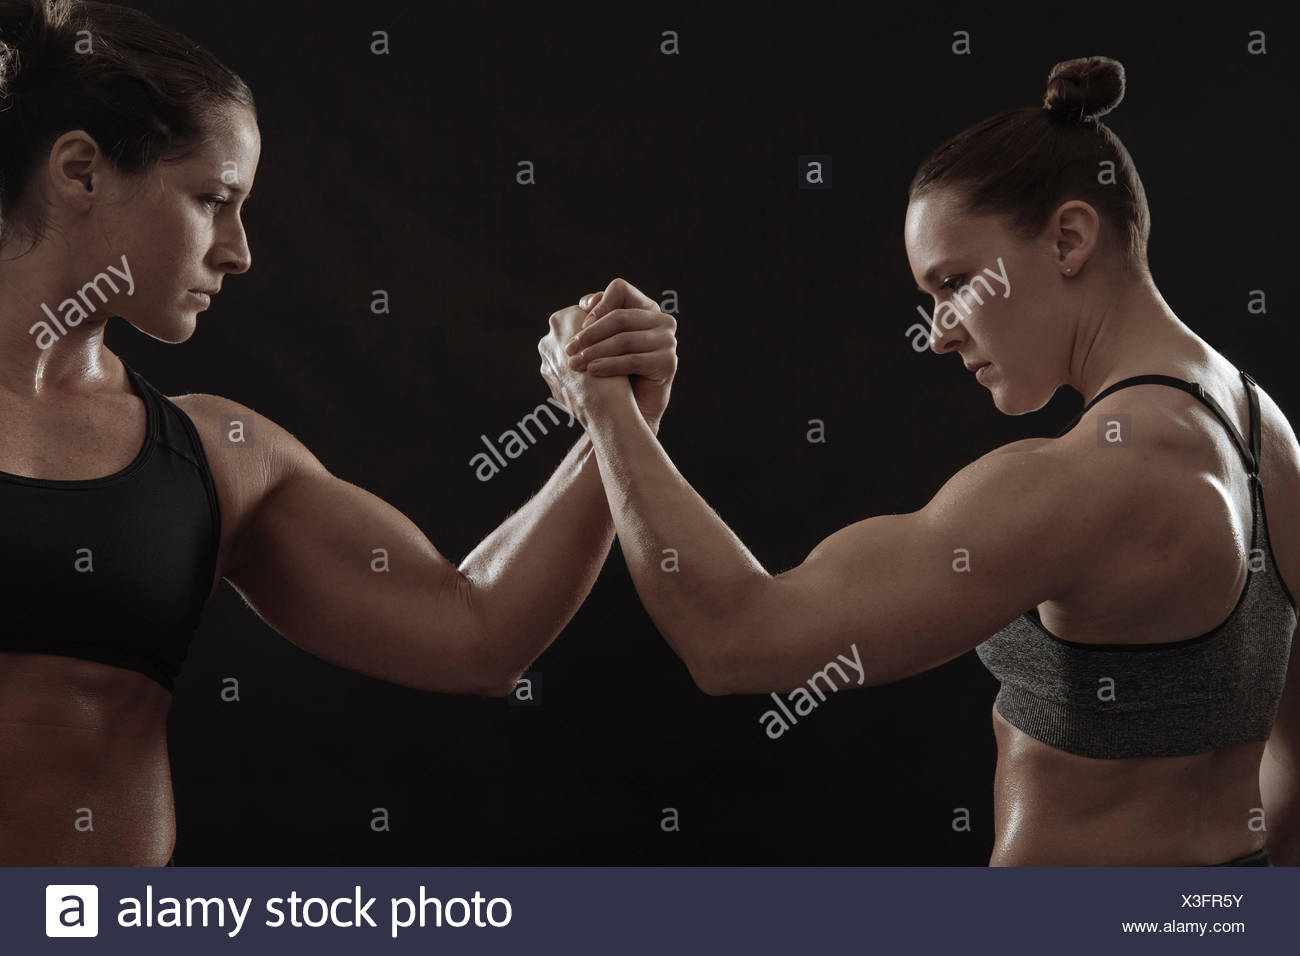 Women Arm Wrestling Stock Photos & Women Arm Wrestling Stock Images